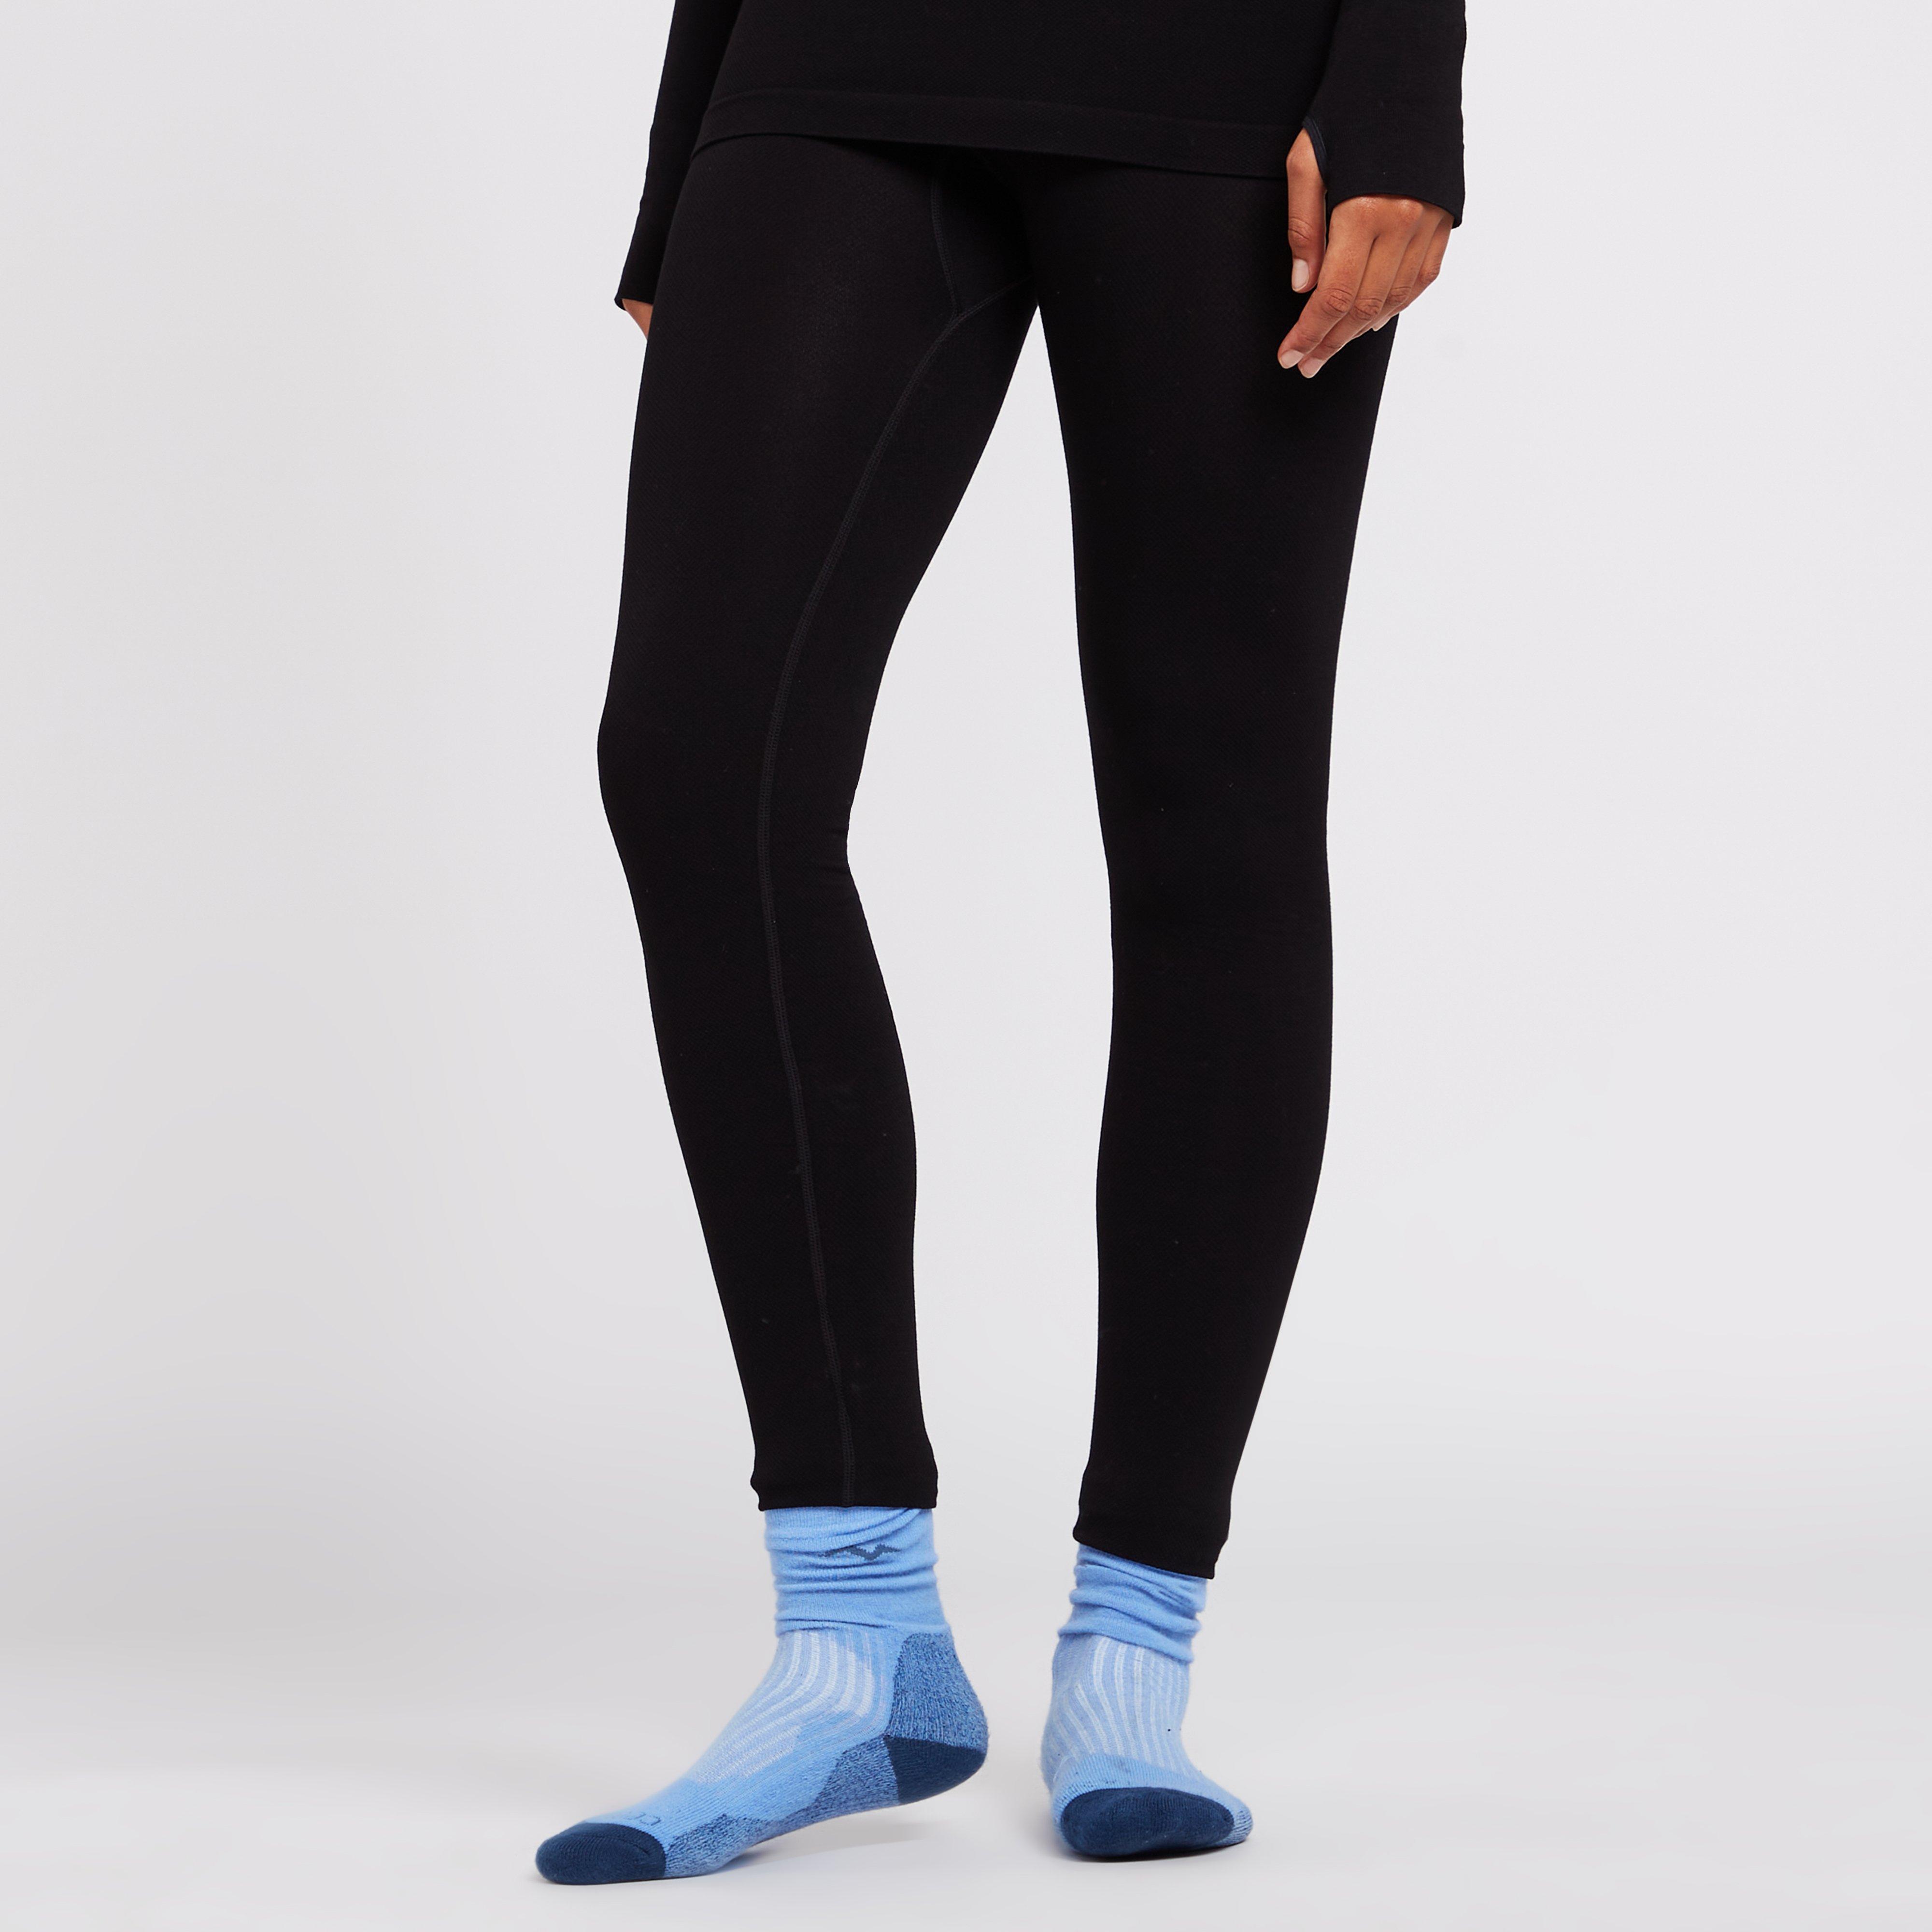 Oex Women's Barneo Base Leggings - Black/Wmns, Black